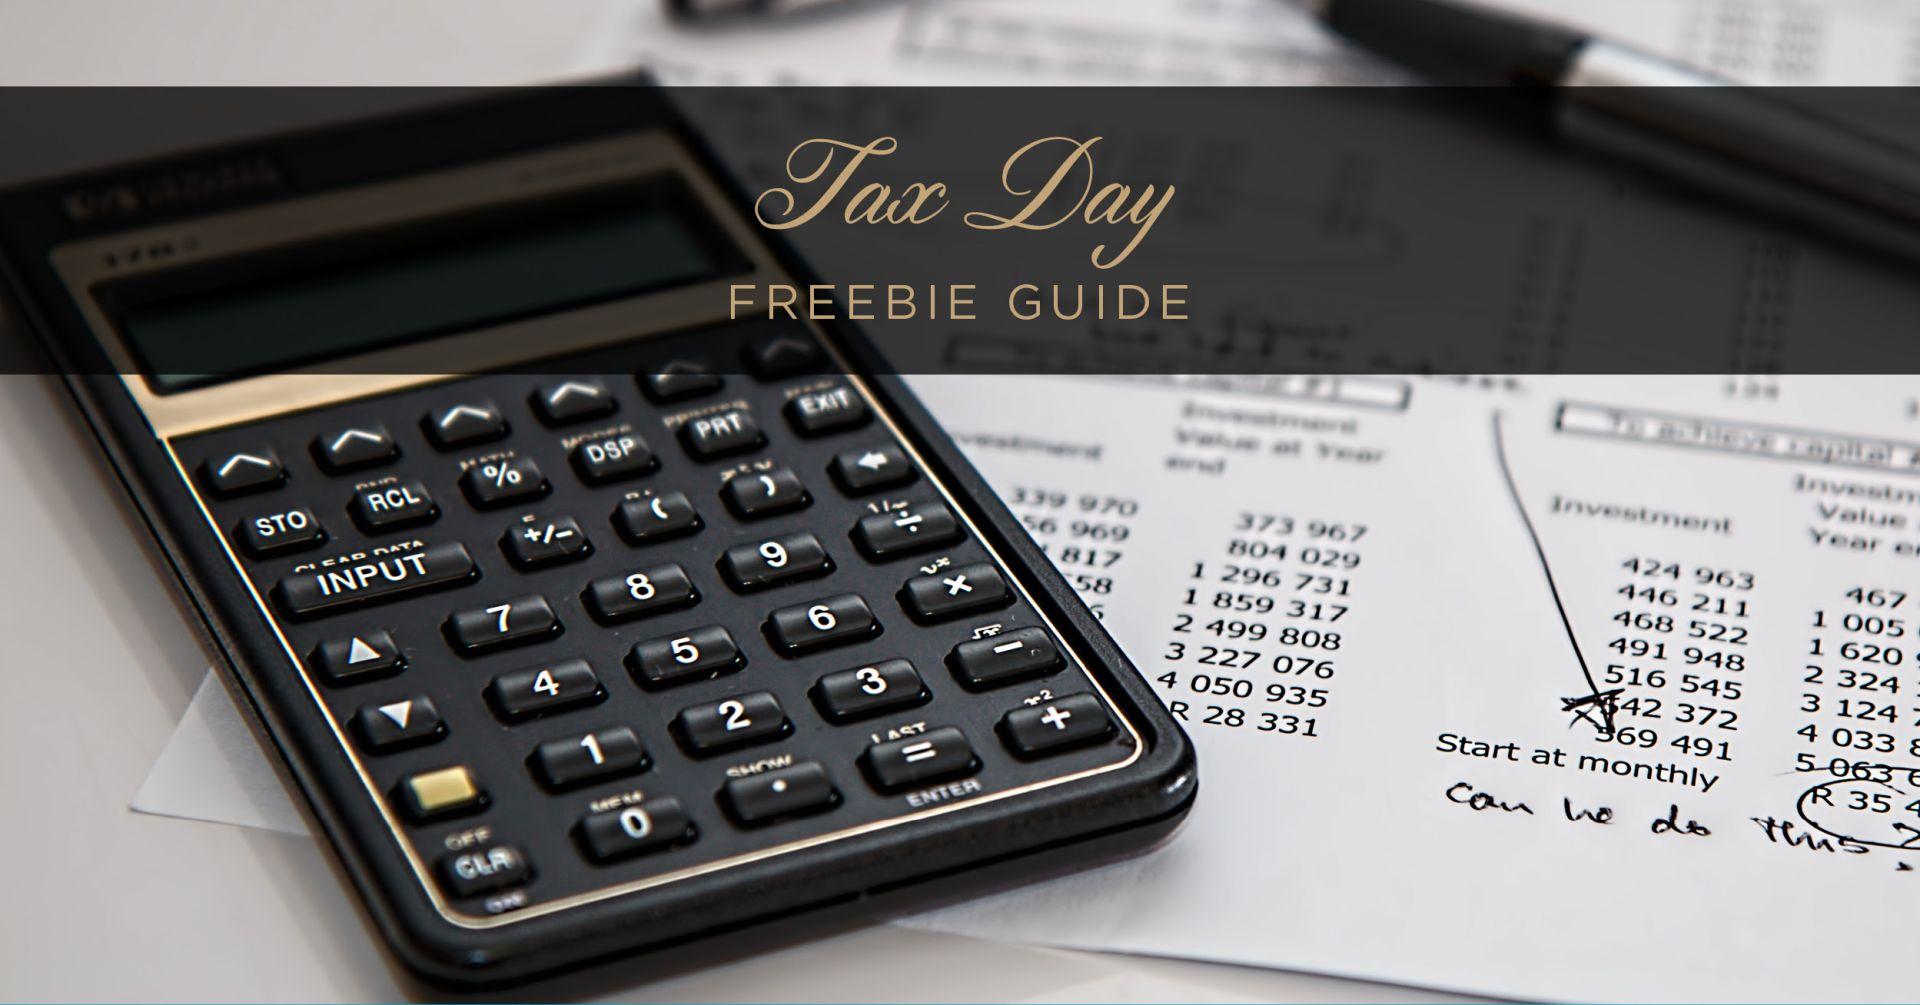 Tax Day Freebie Guide